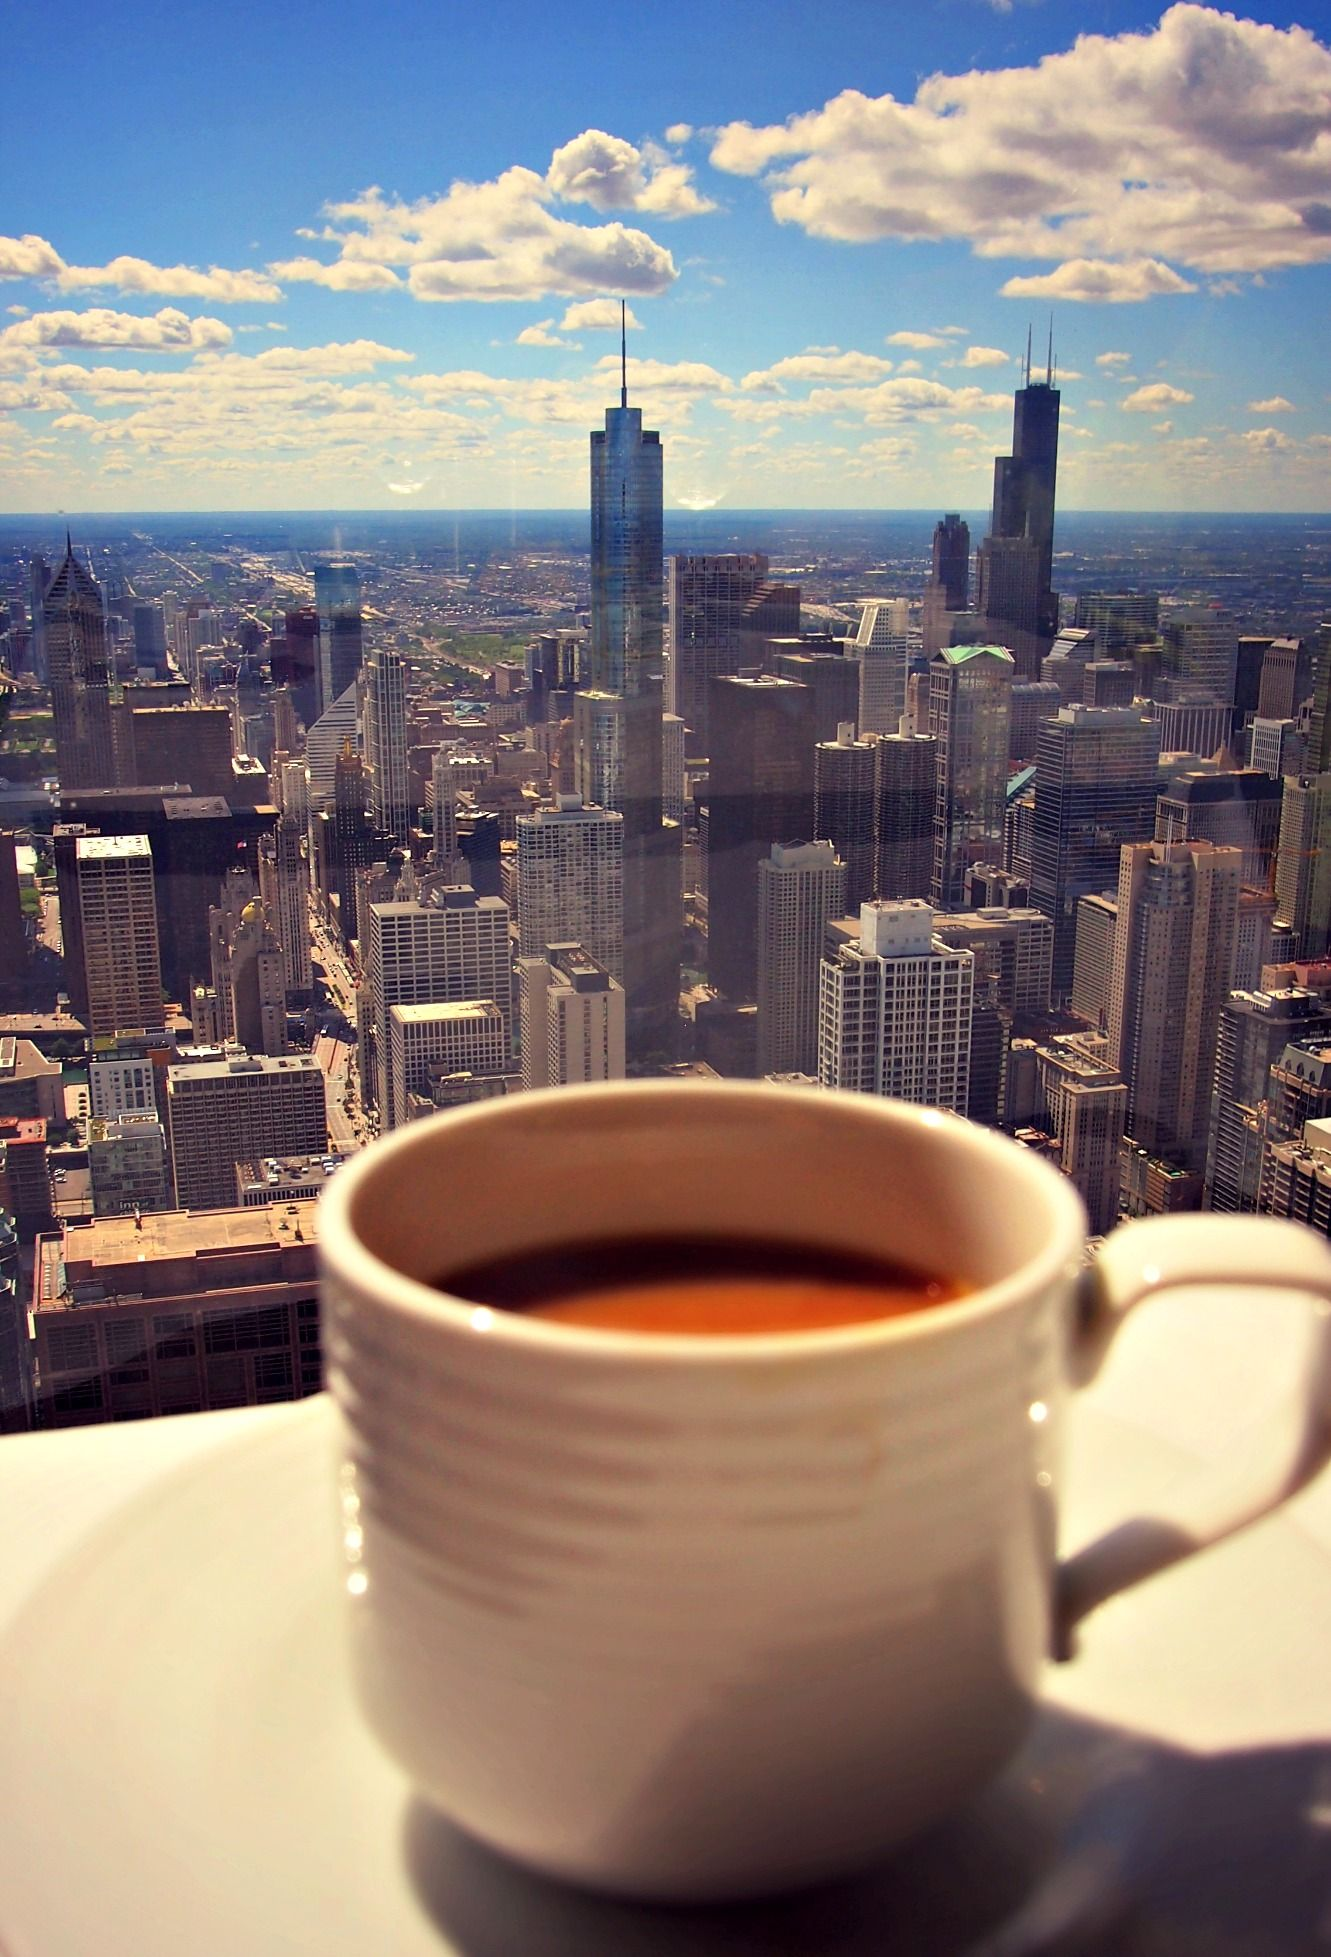 Coffee and skylines